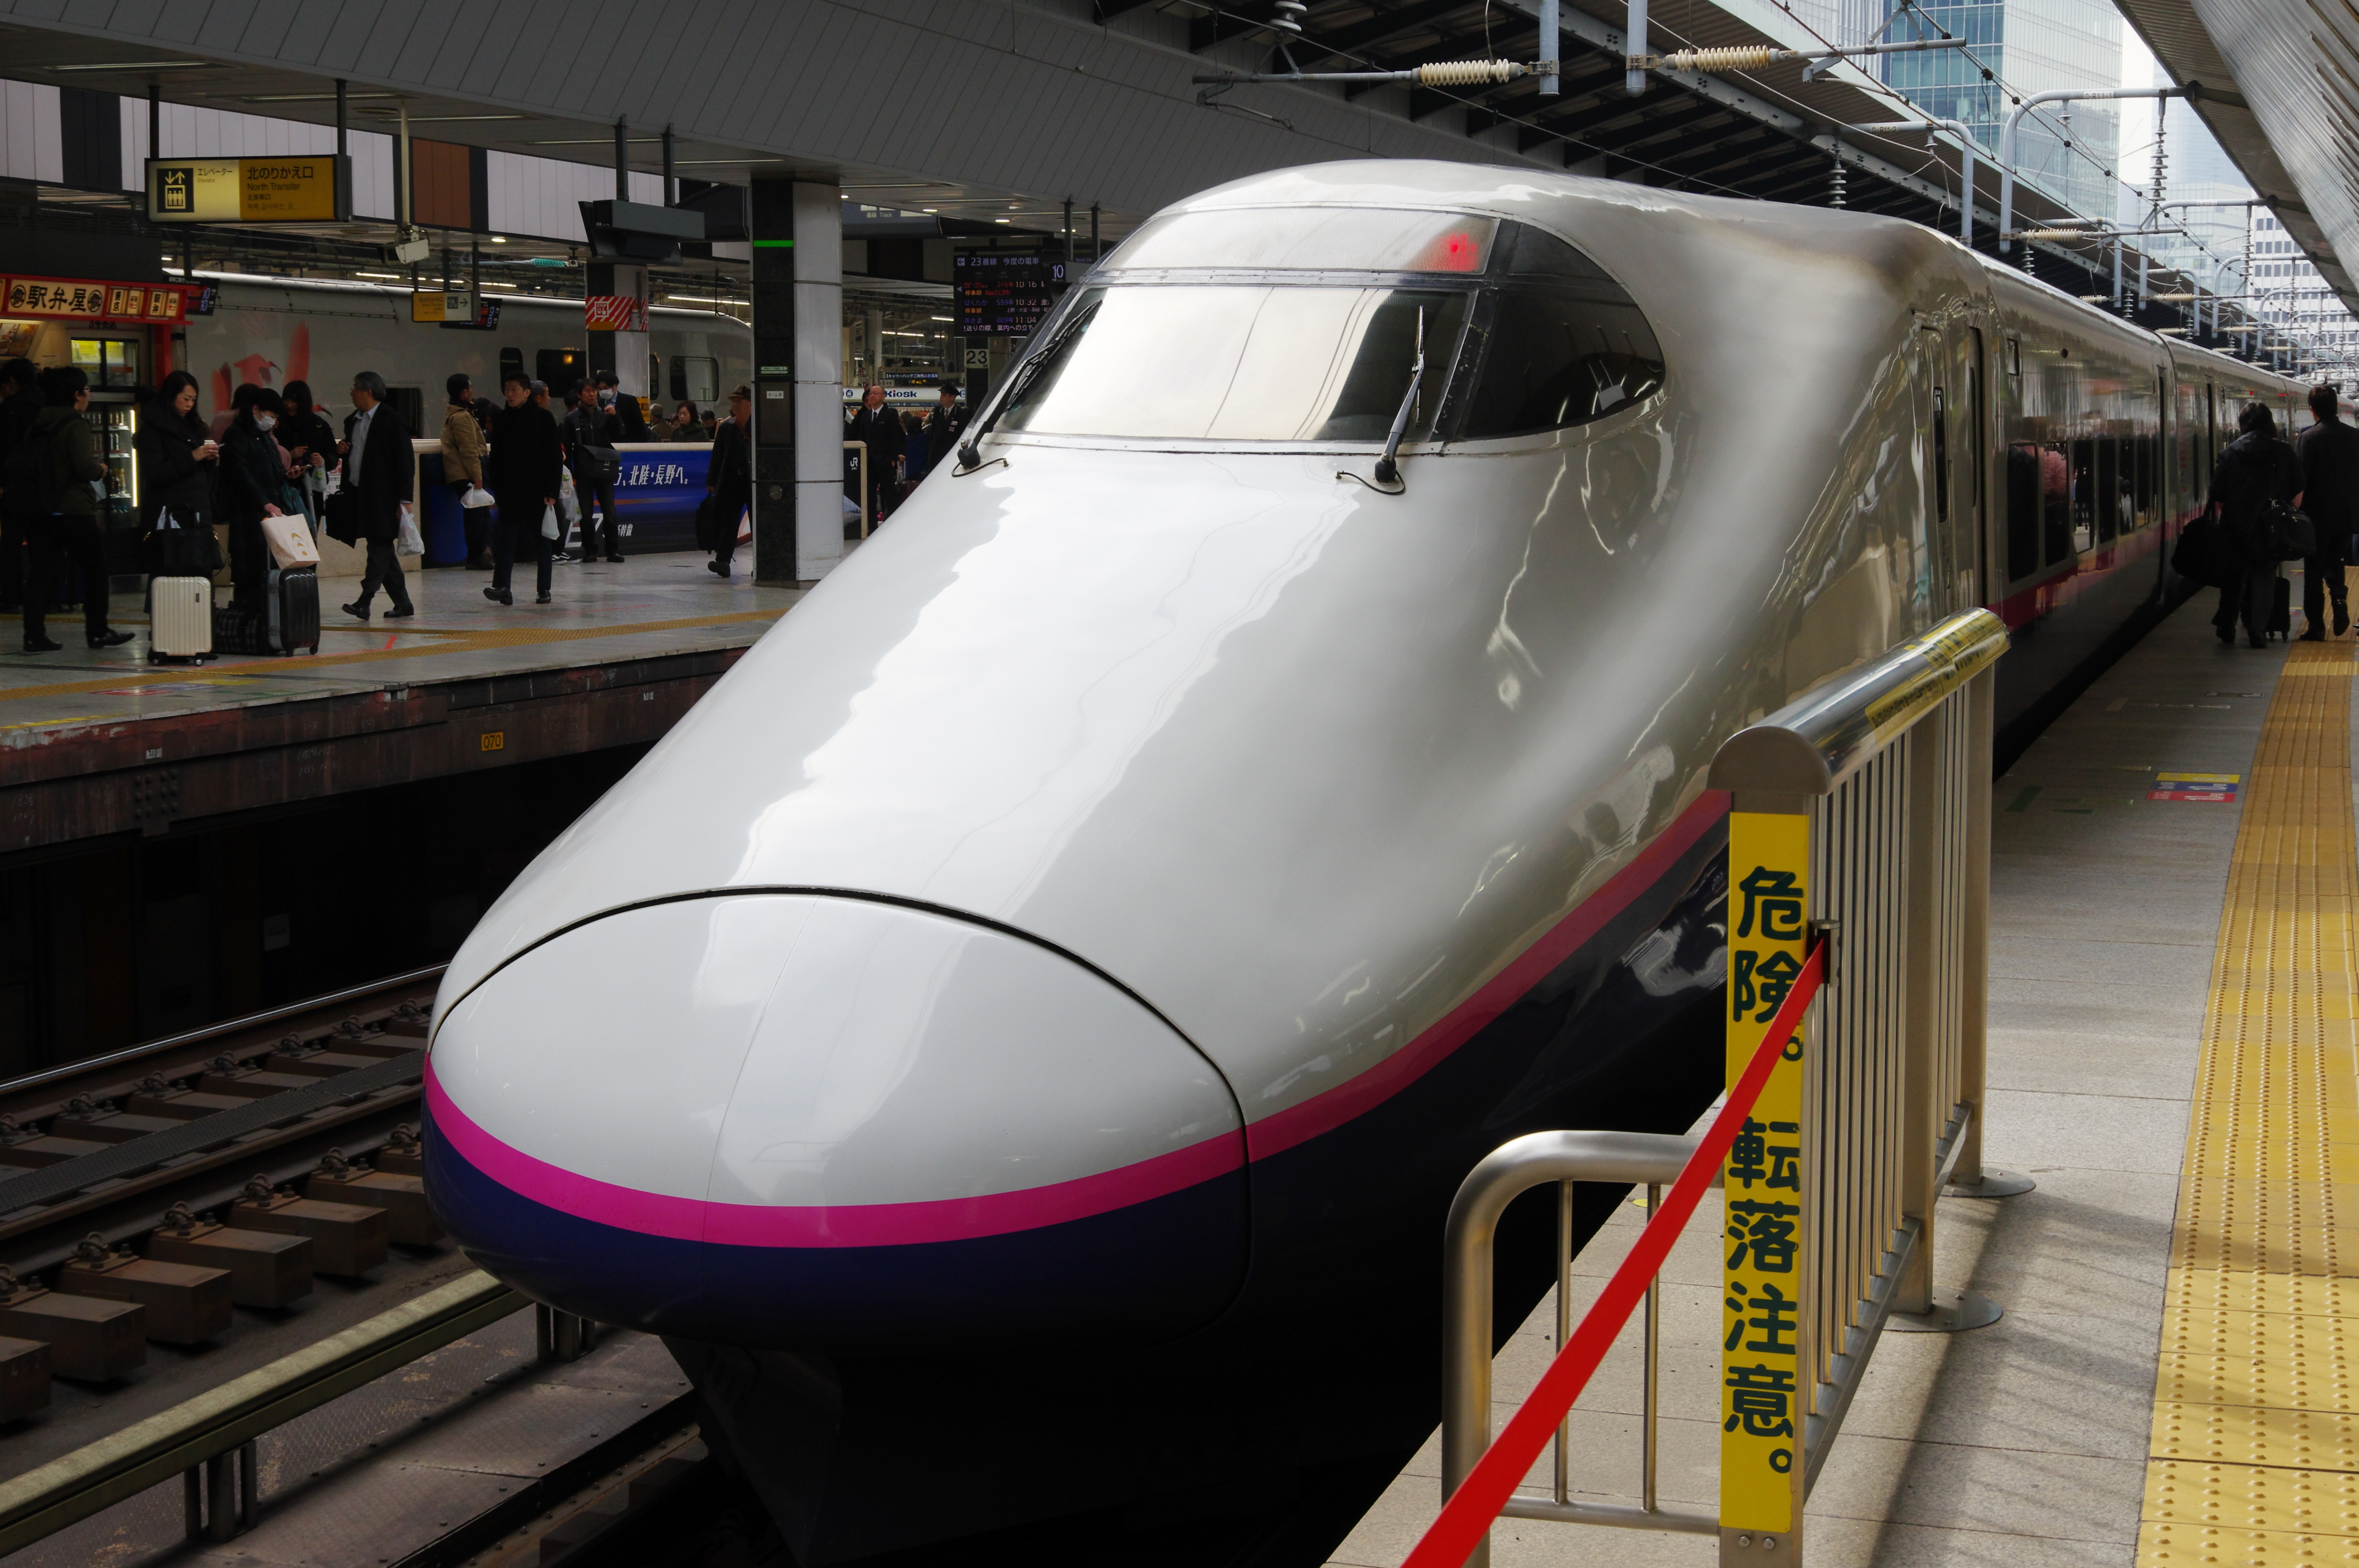 E2系1000番台 やまびこ207号 東京駅 190225.jpg